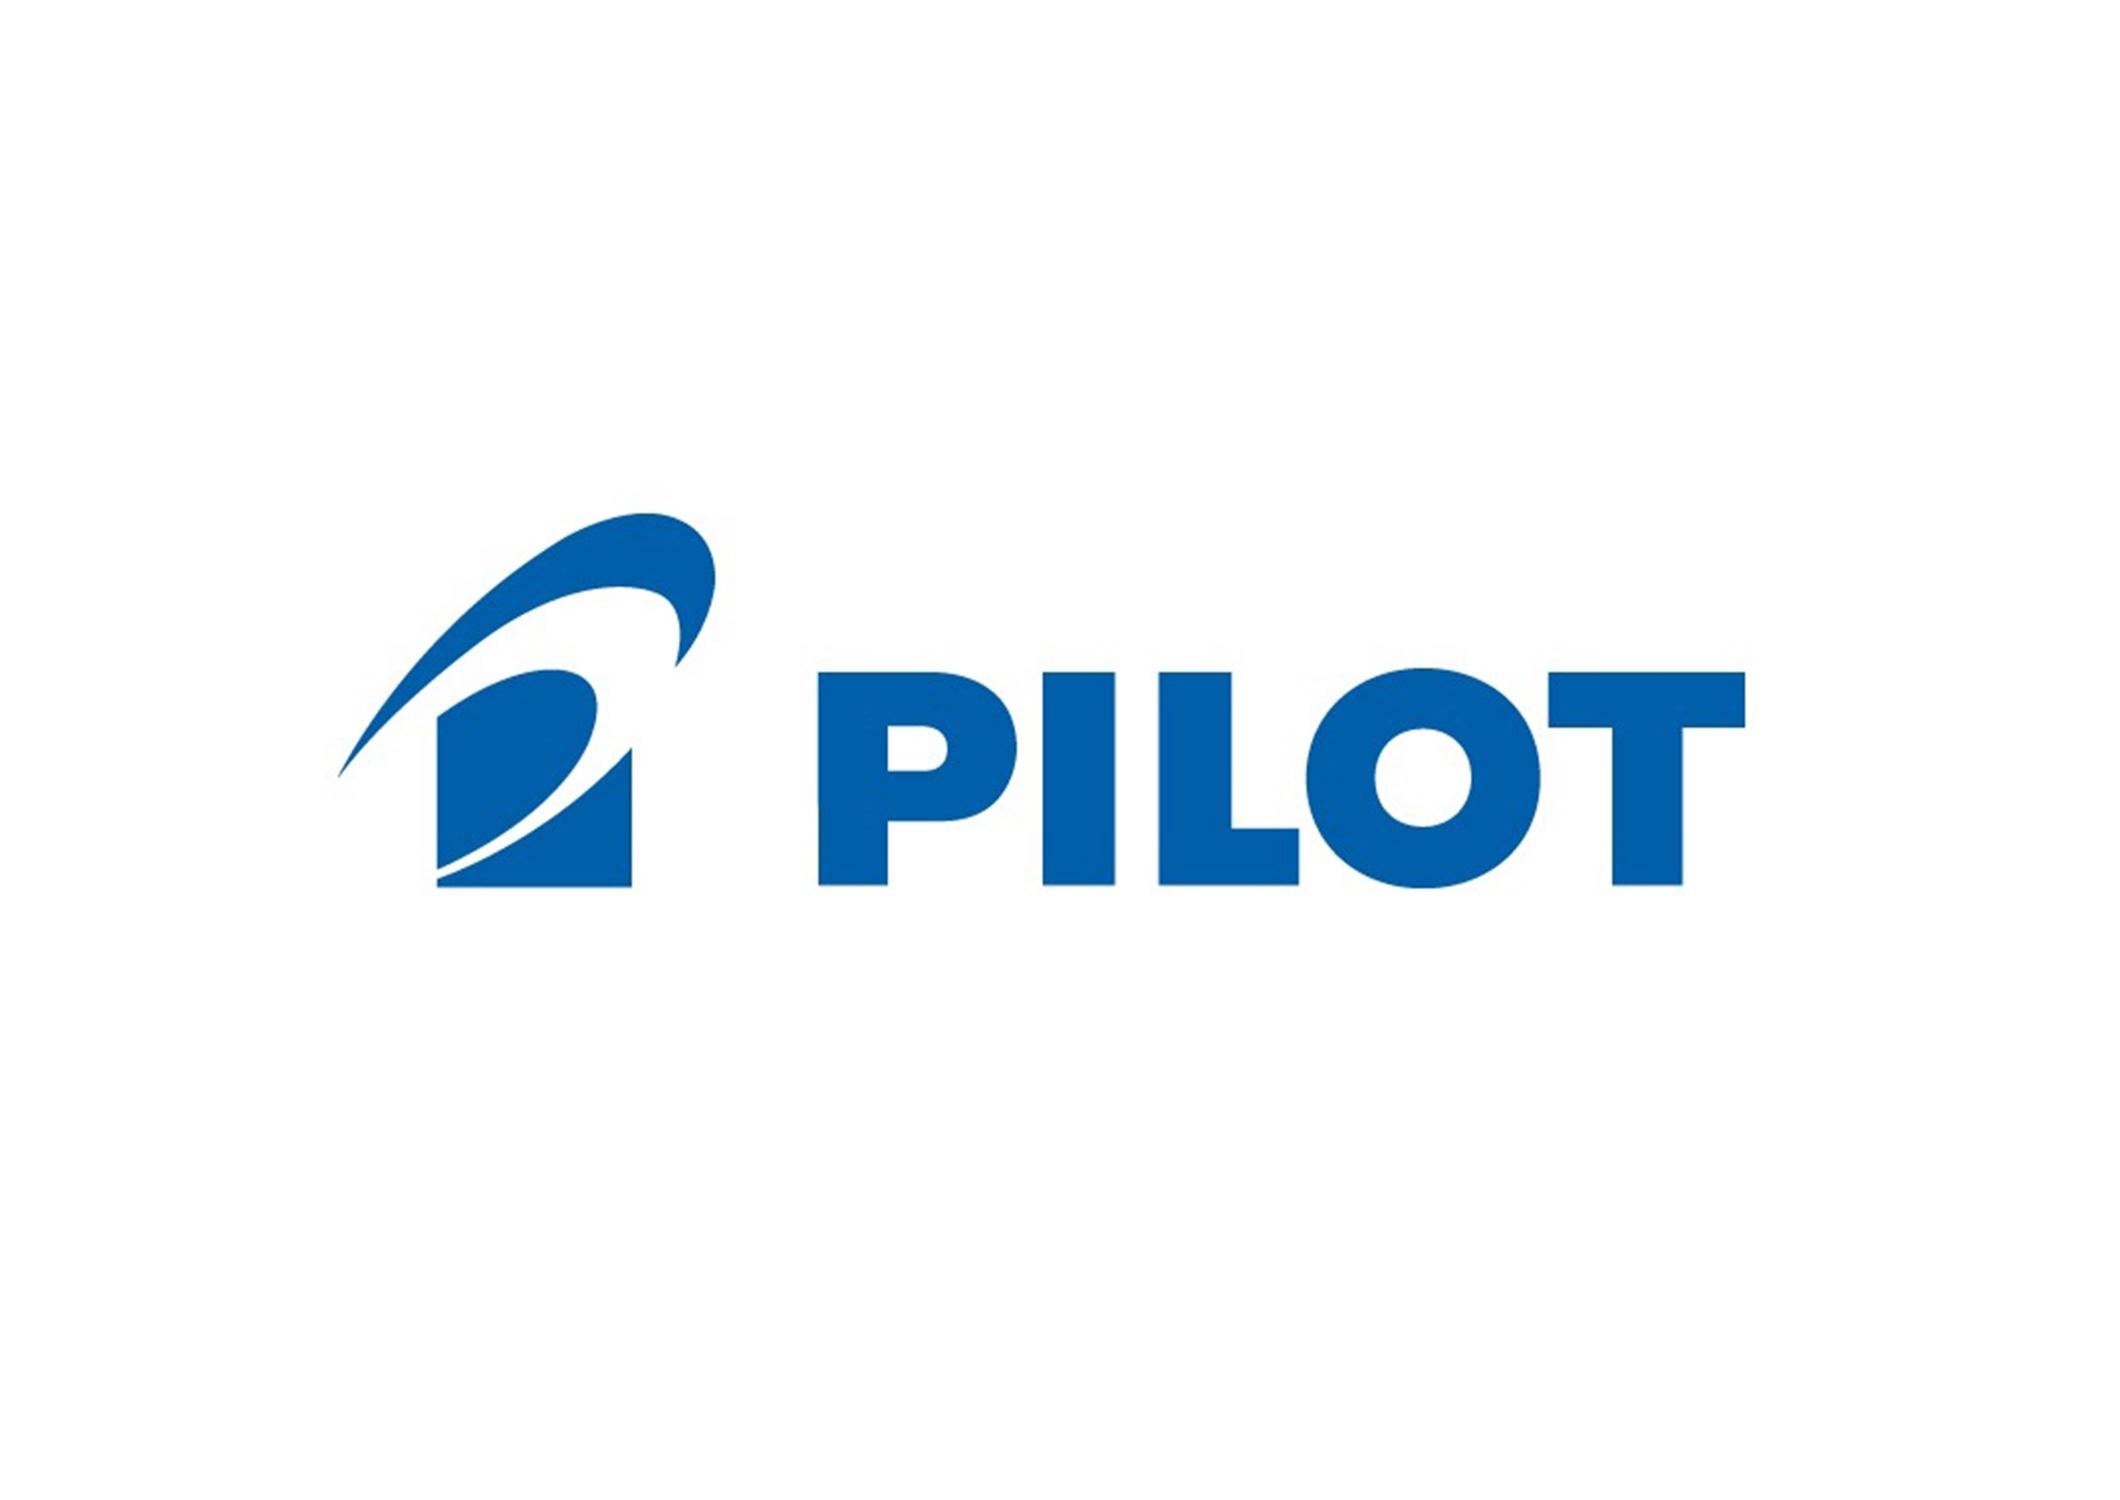 Pilot Singapore